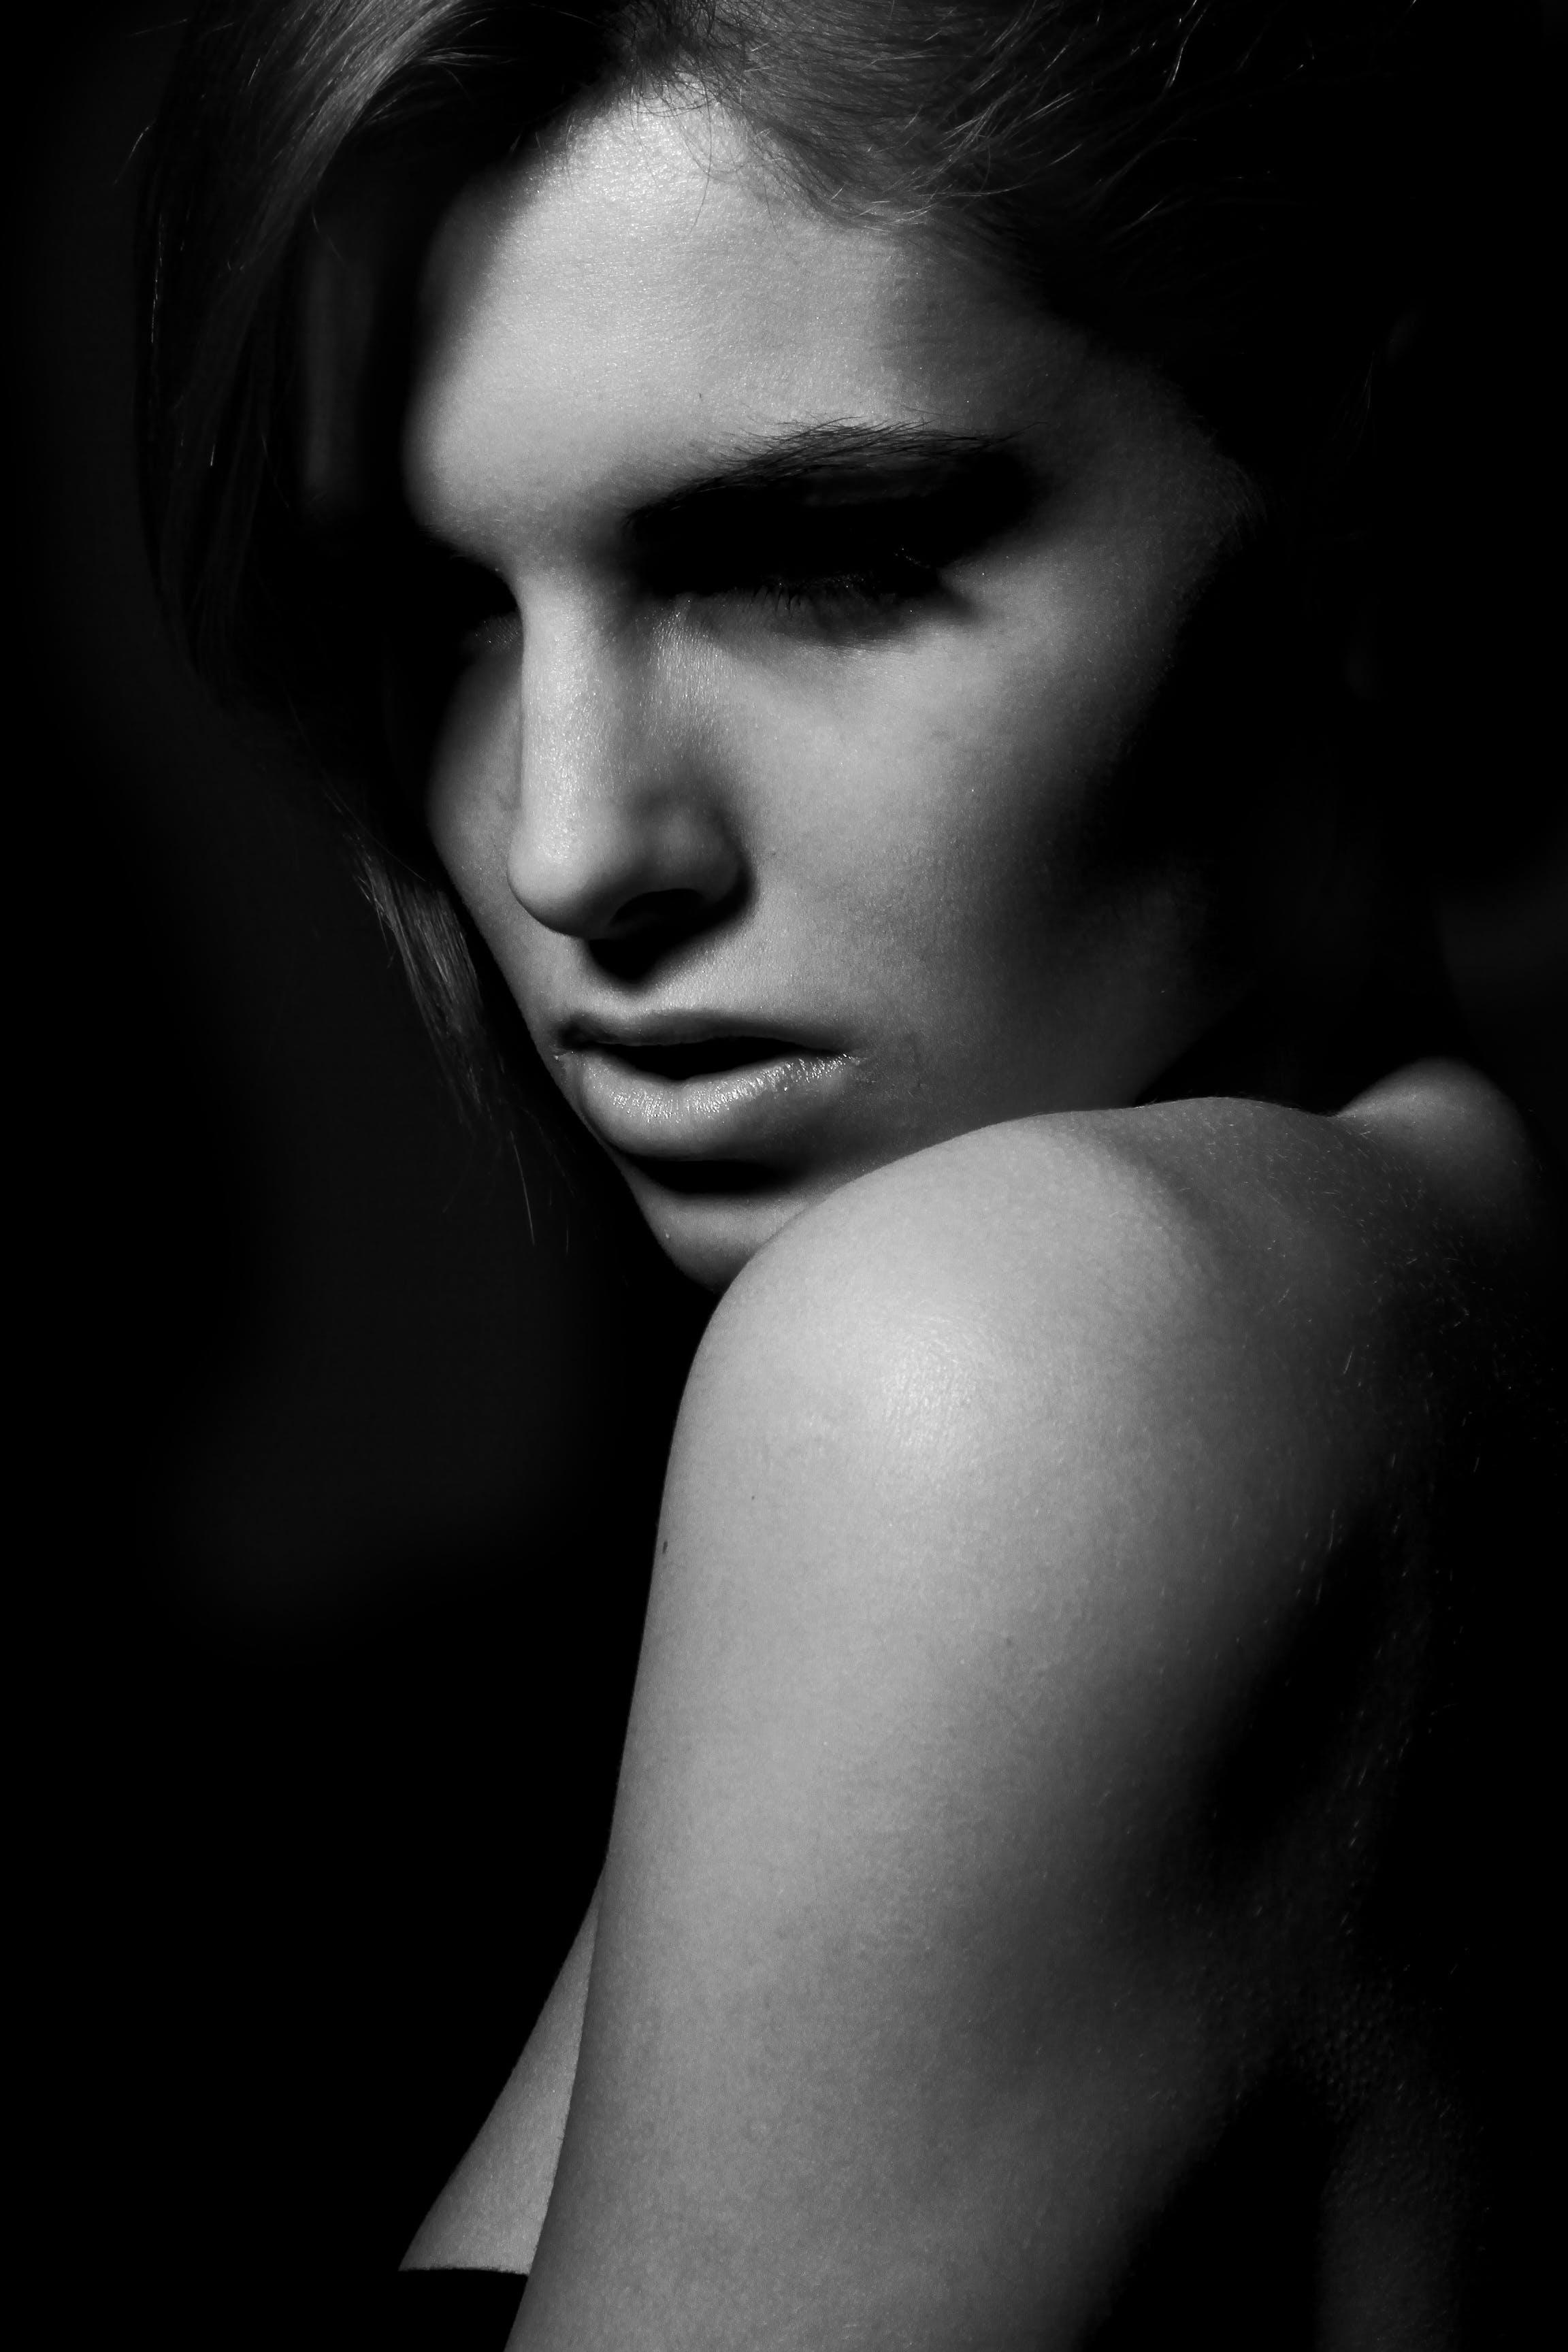 Free stock photo of person, woman, dark, girl